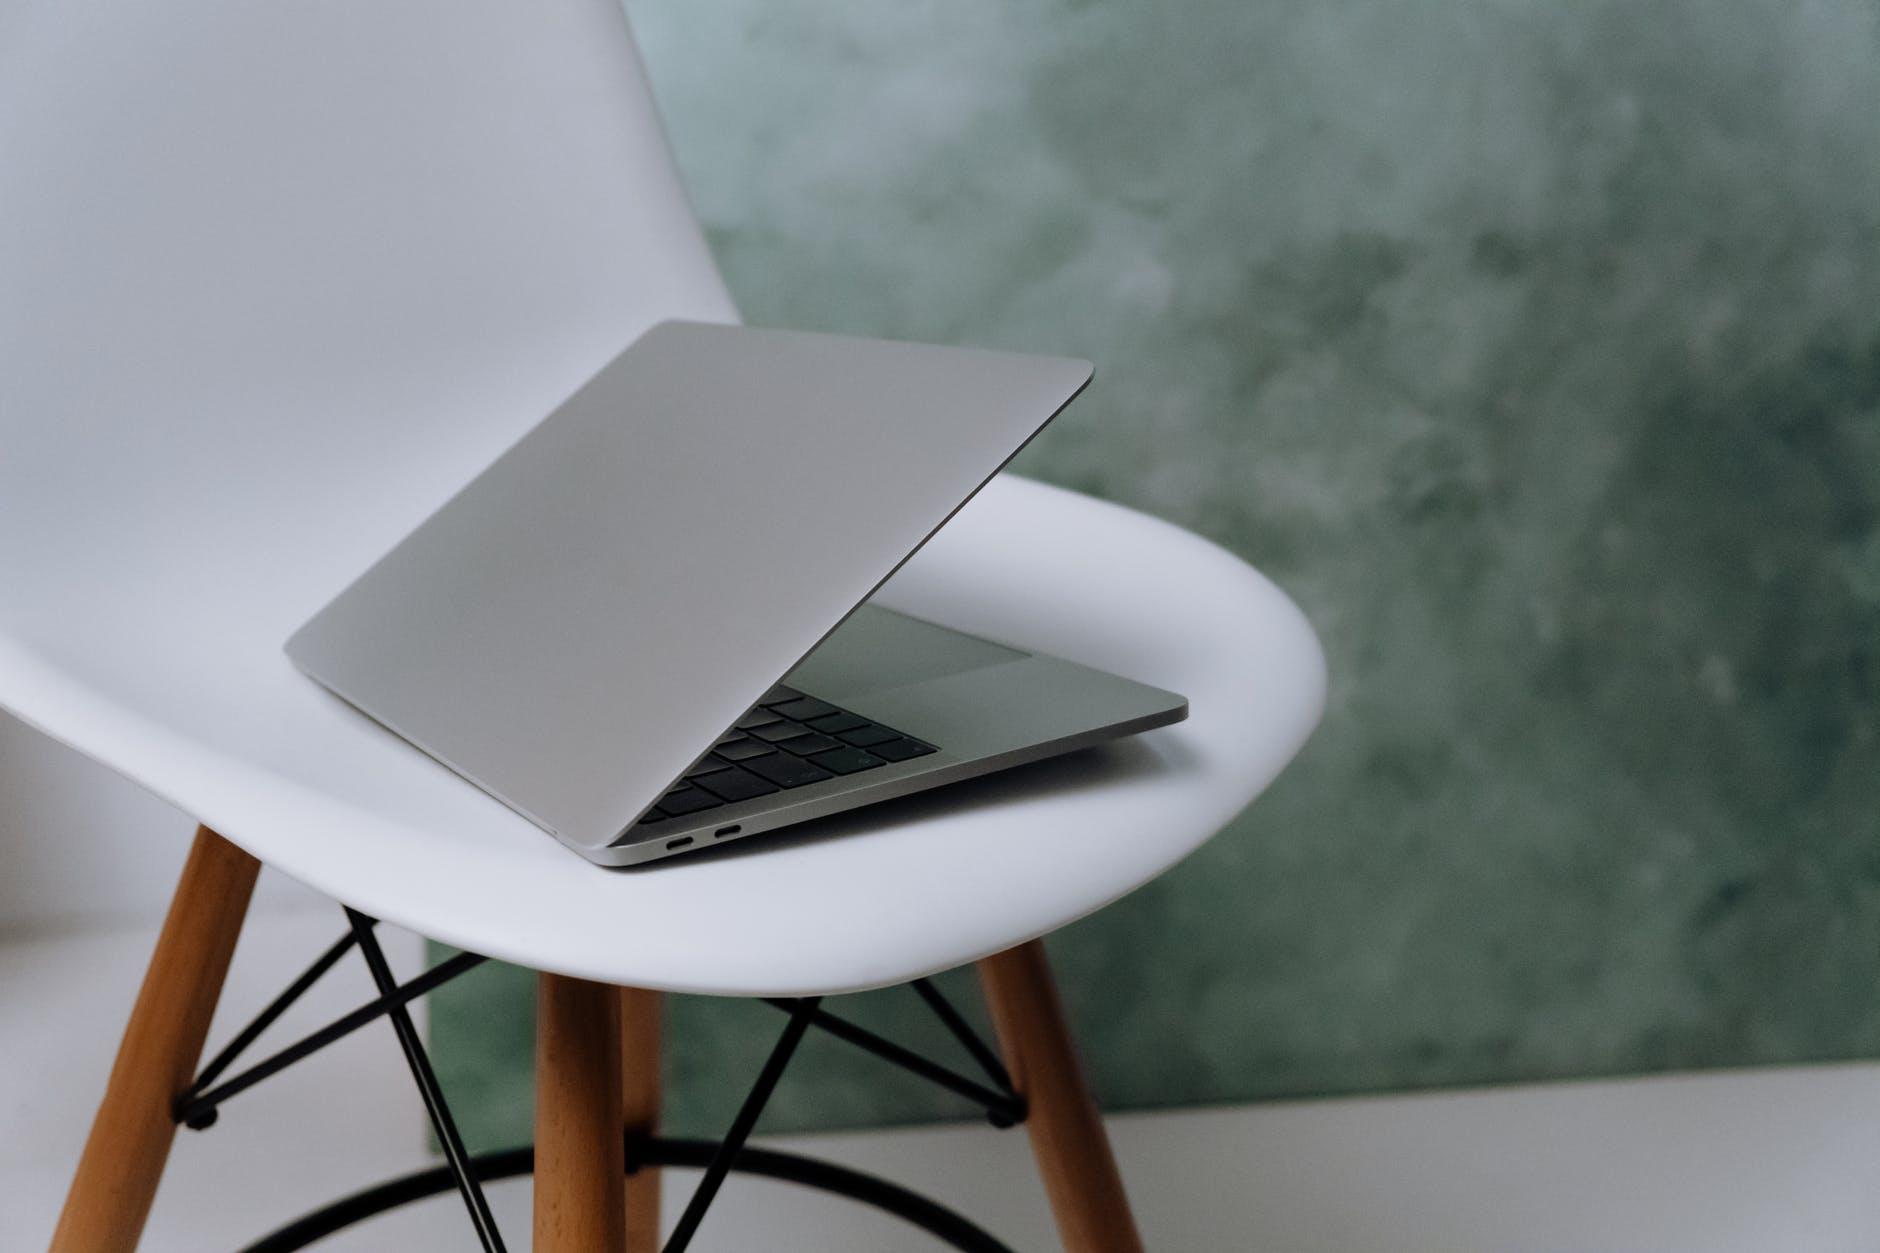 Laptop on plastic chair